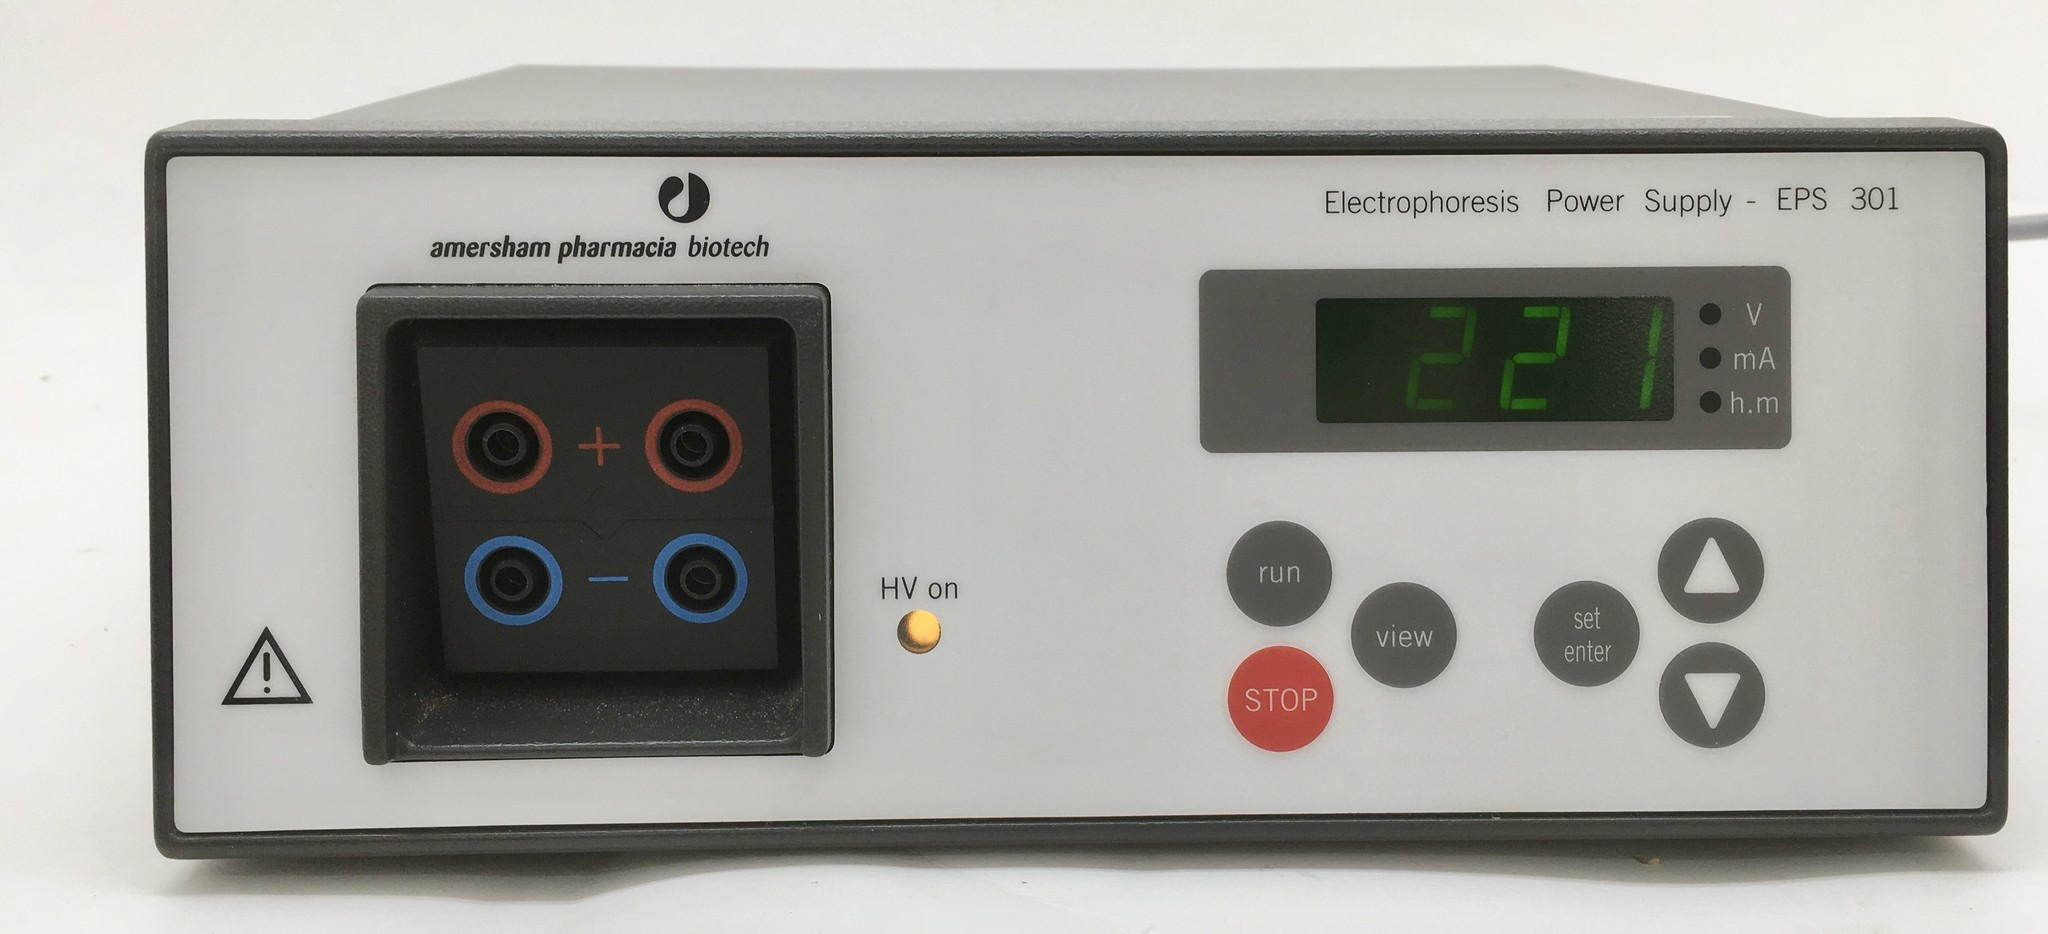 GE GE Healthcare EPS 301 Powersupply